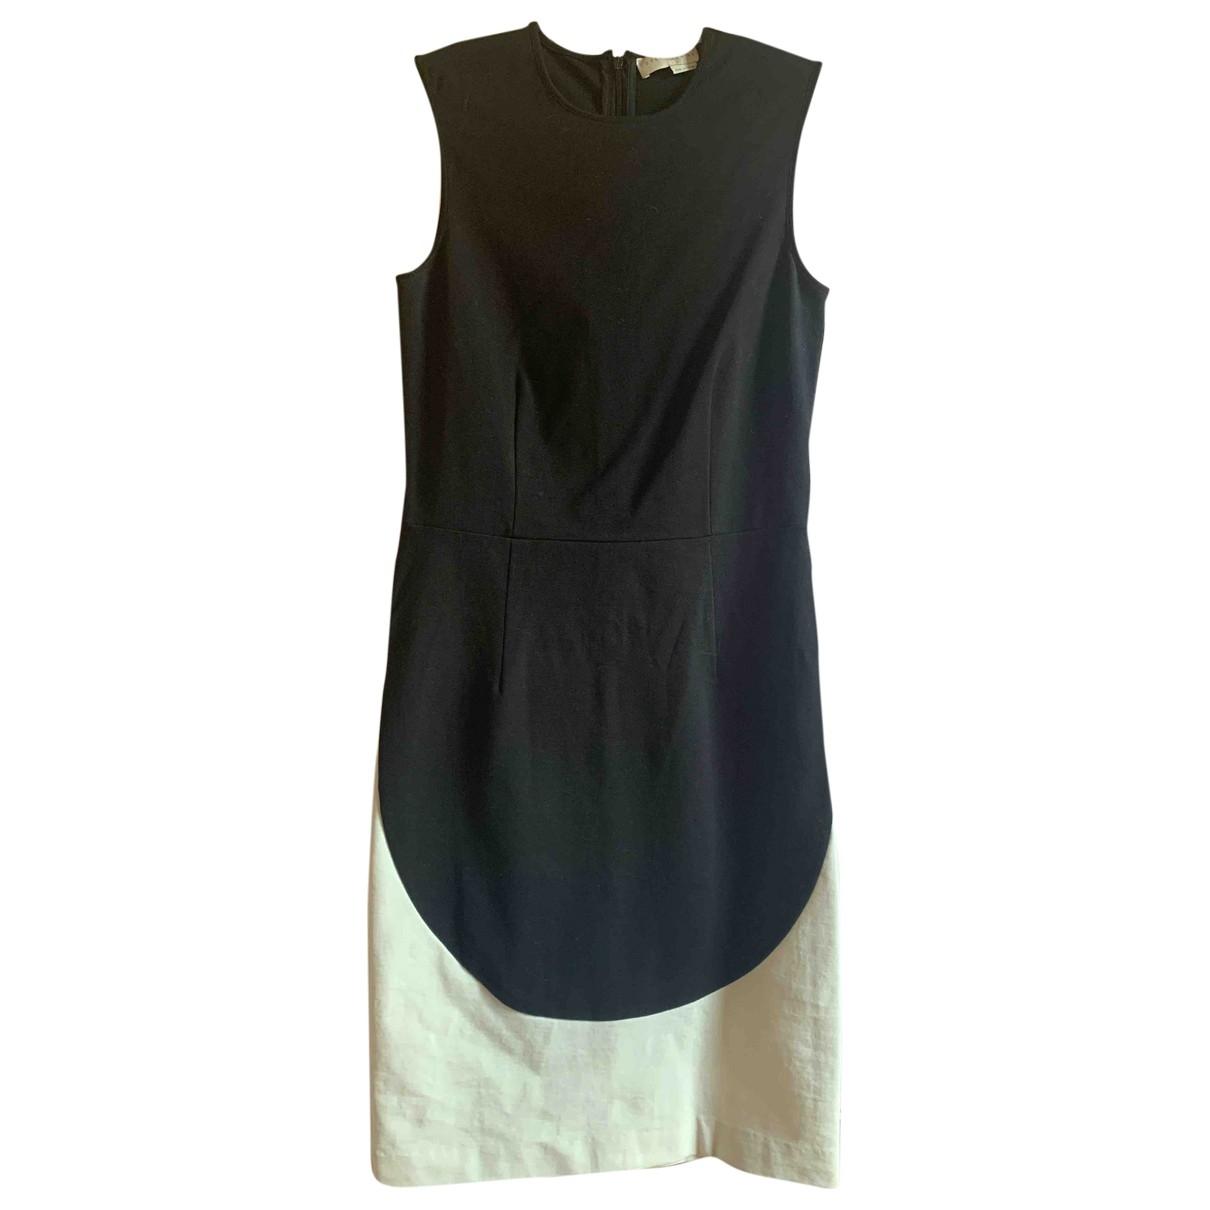 Stella Mccartney \N Black Cotton - elasthane dress for Women 46 IT